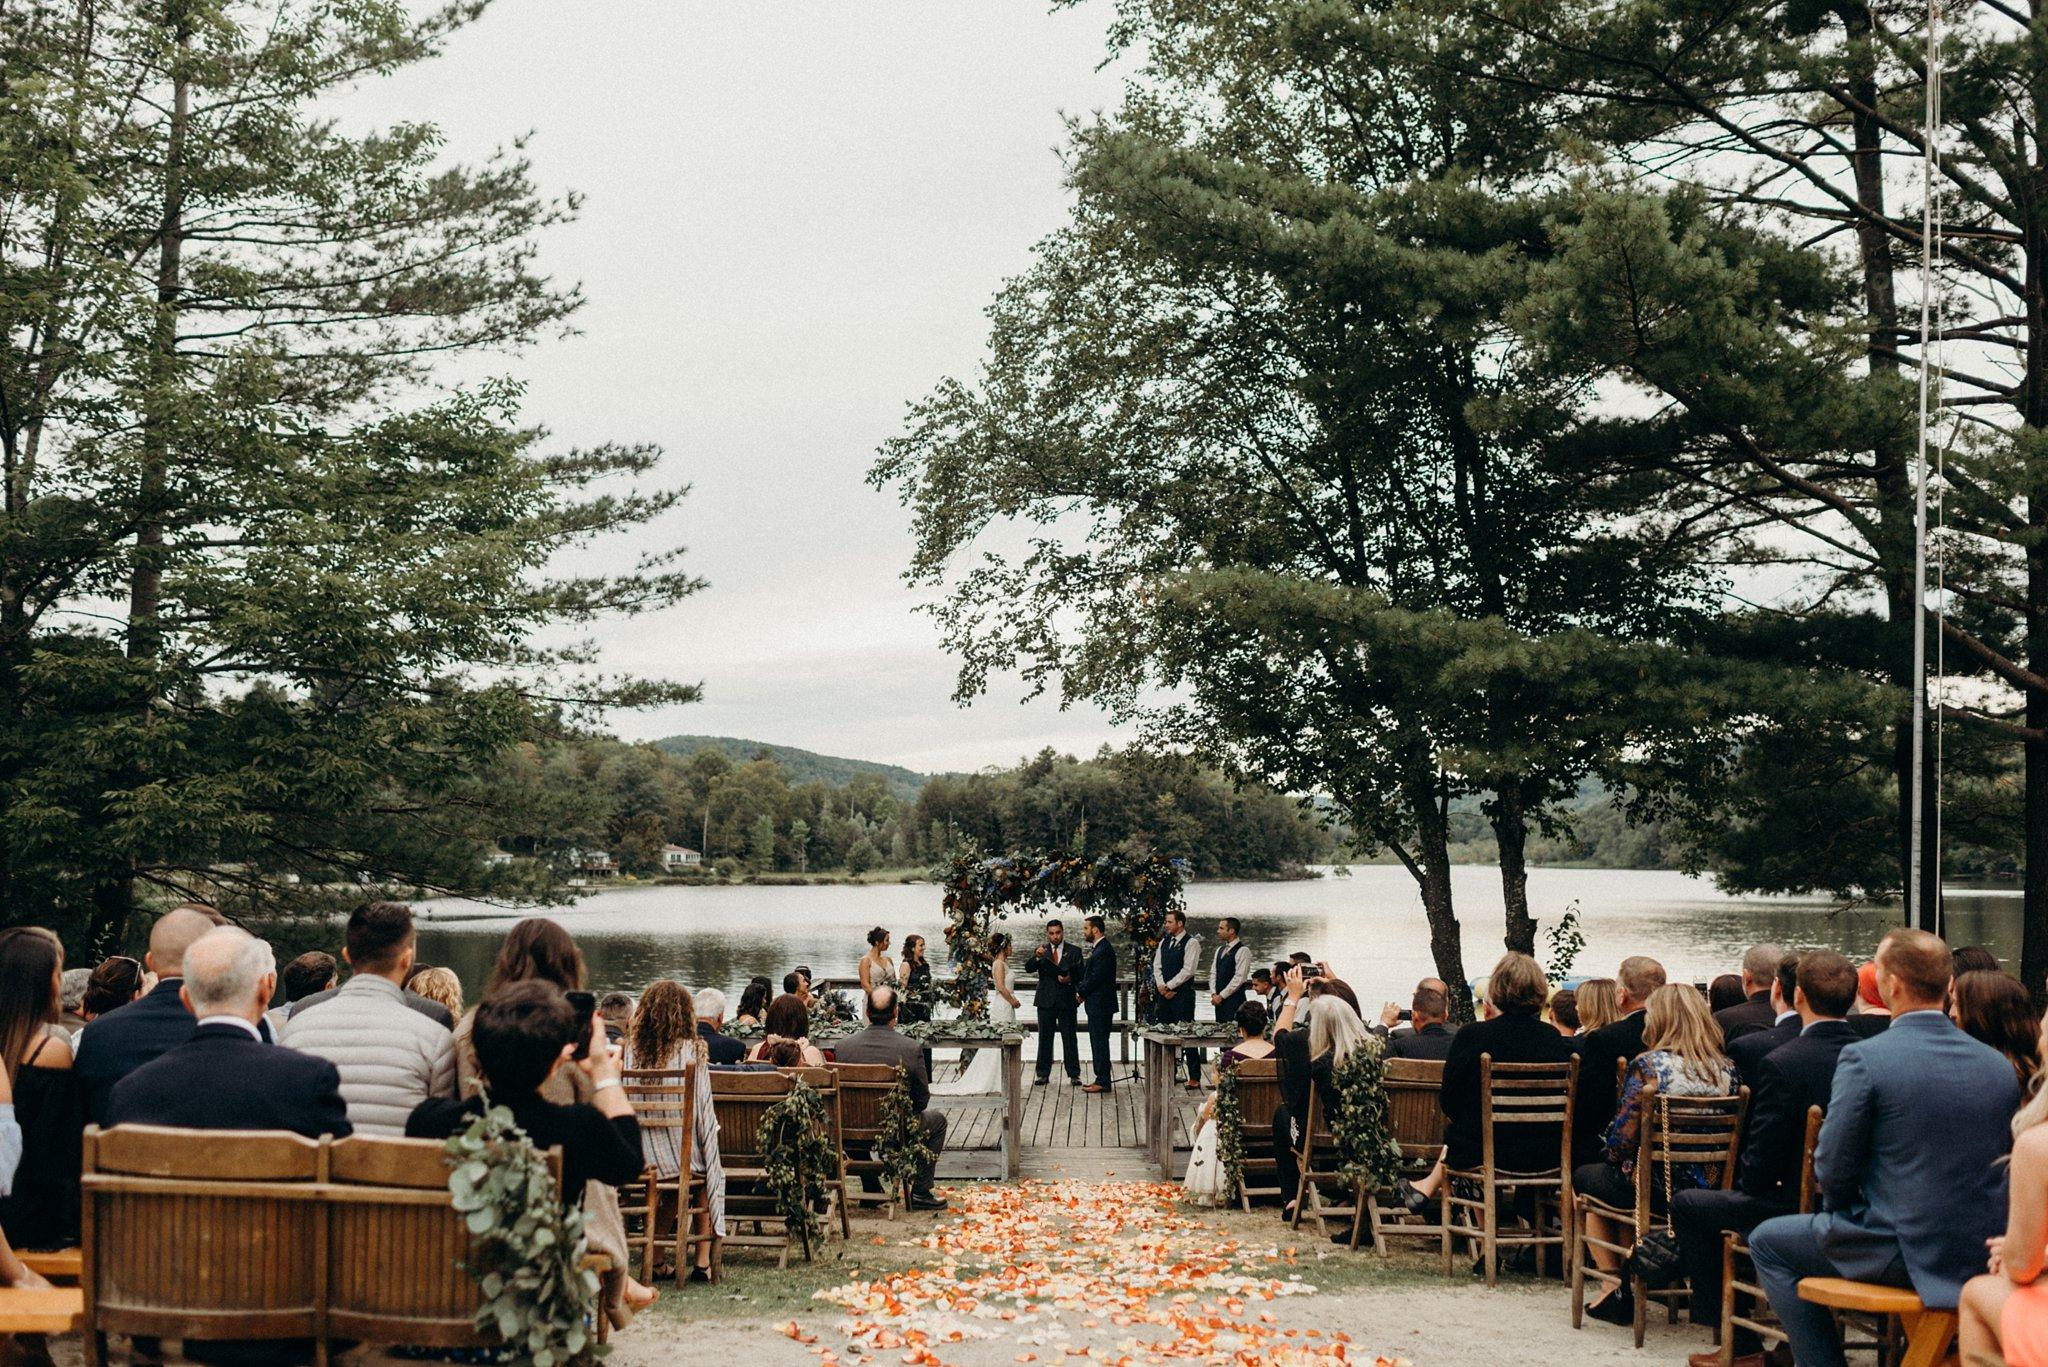 kaihla_tonai_intimate_wedding_elopement_photographer_6628.jpg